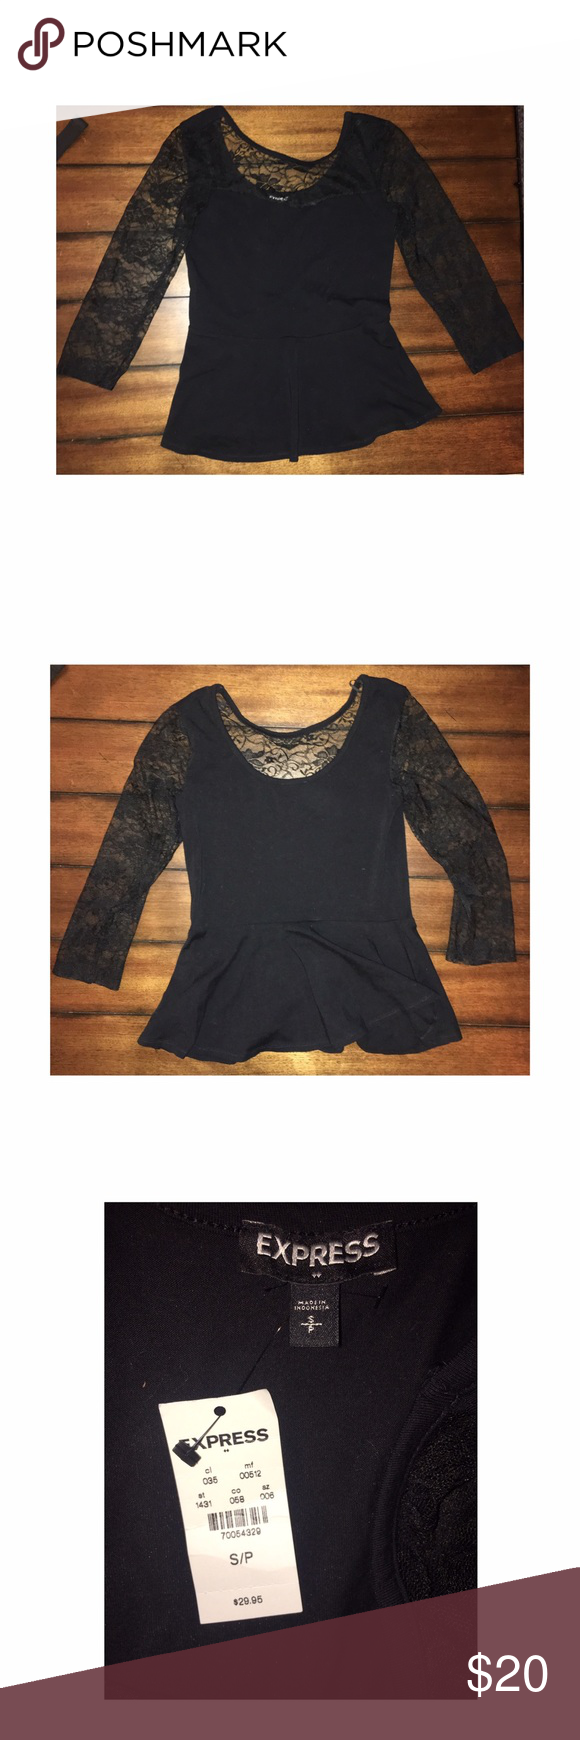 Black t shirt express - Express Shirt Beautiful Black Never Worn Laced Sleeve Shirt Express Other